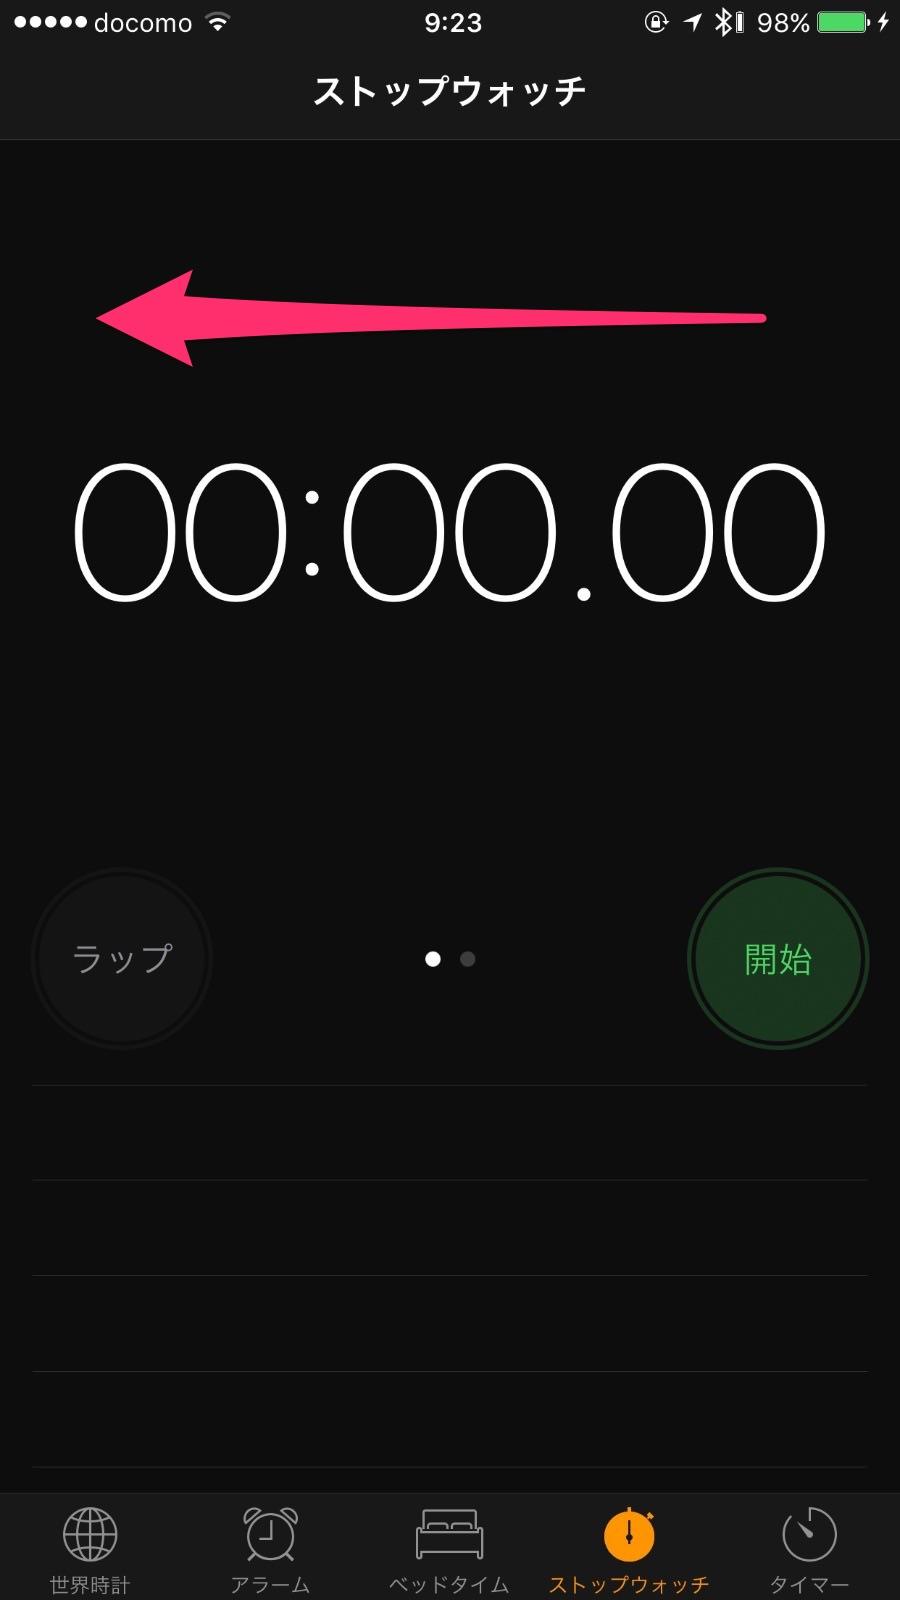 Iphone stop watch 9451